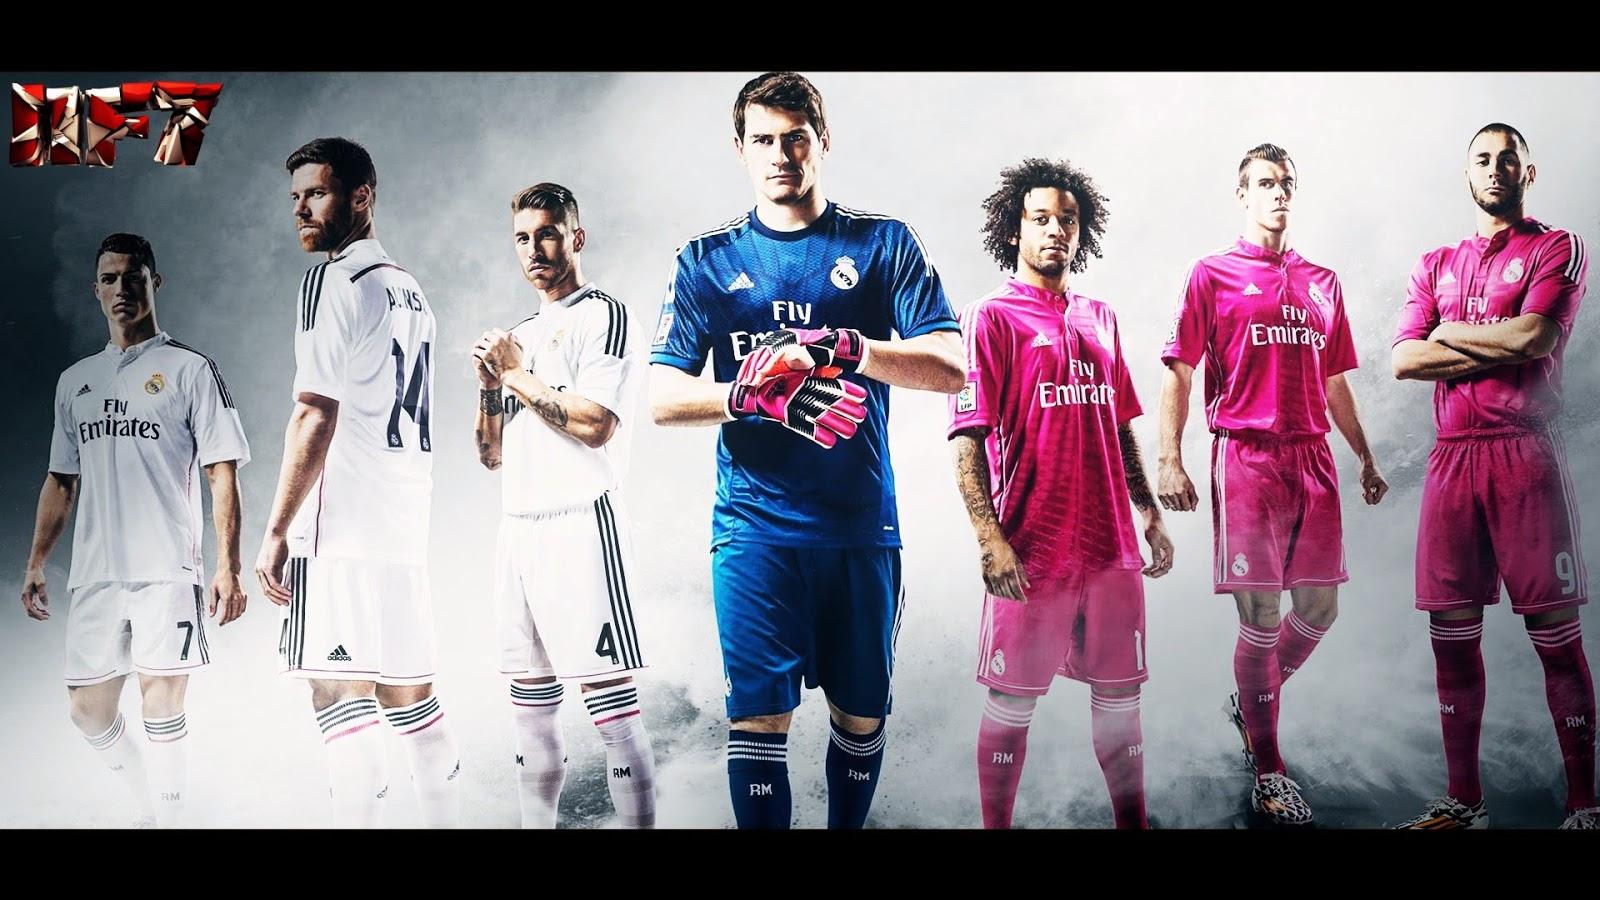 Real Madrid CF 2015 First Team Squad Wallpaper hd